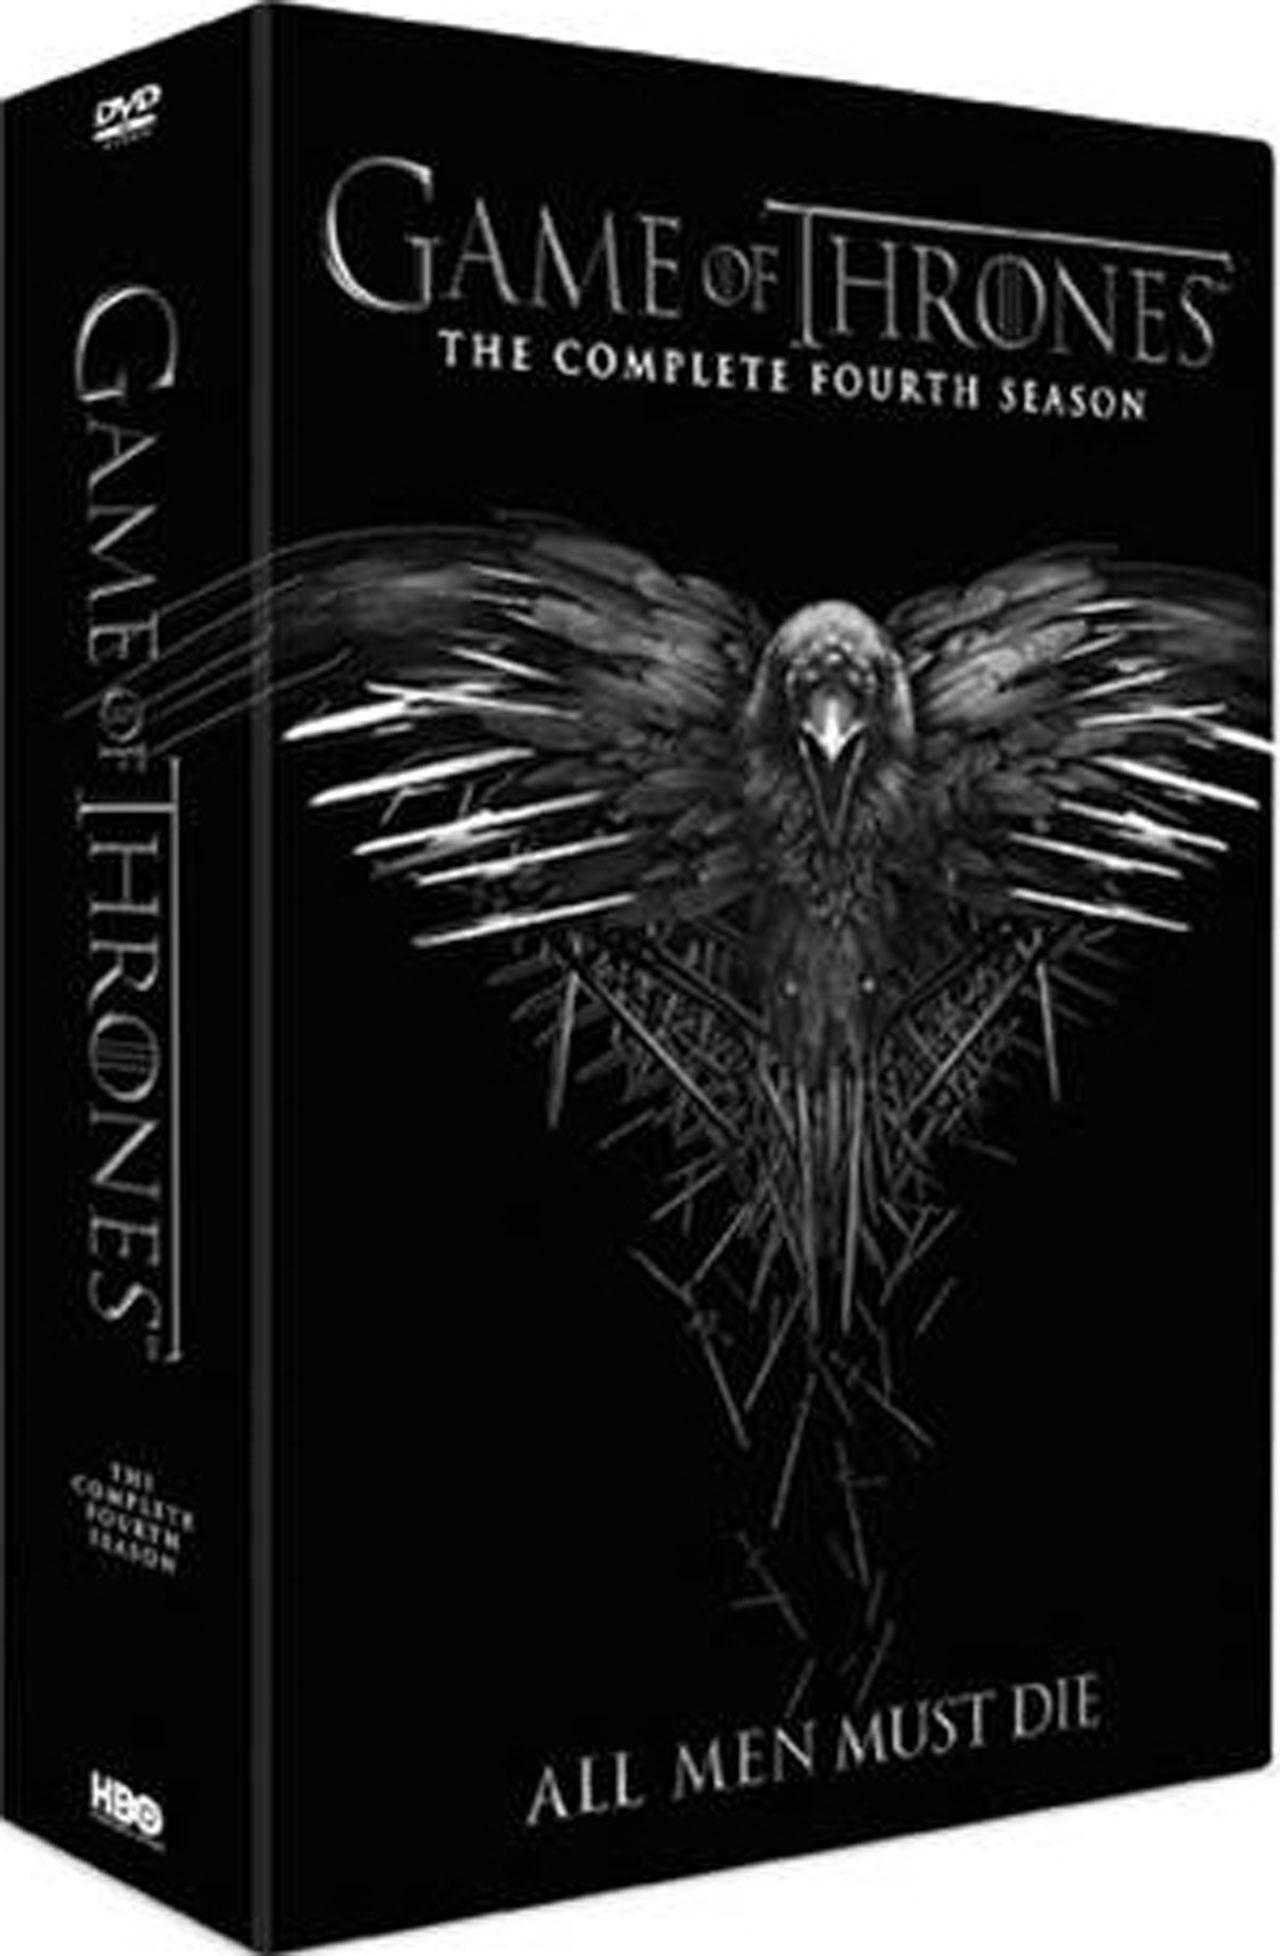 Game of Thrones The Complete 4th Season : มหาศึกชิงบัลลังก์ ปี 4